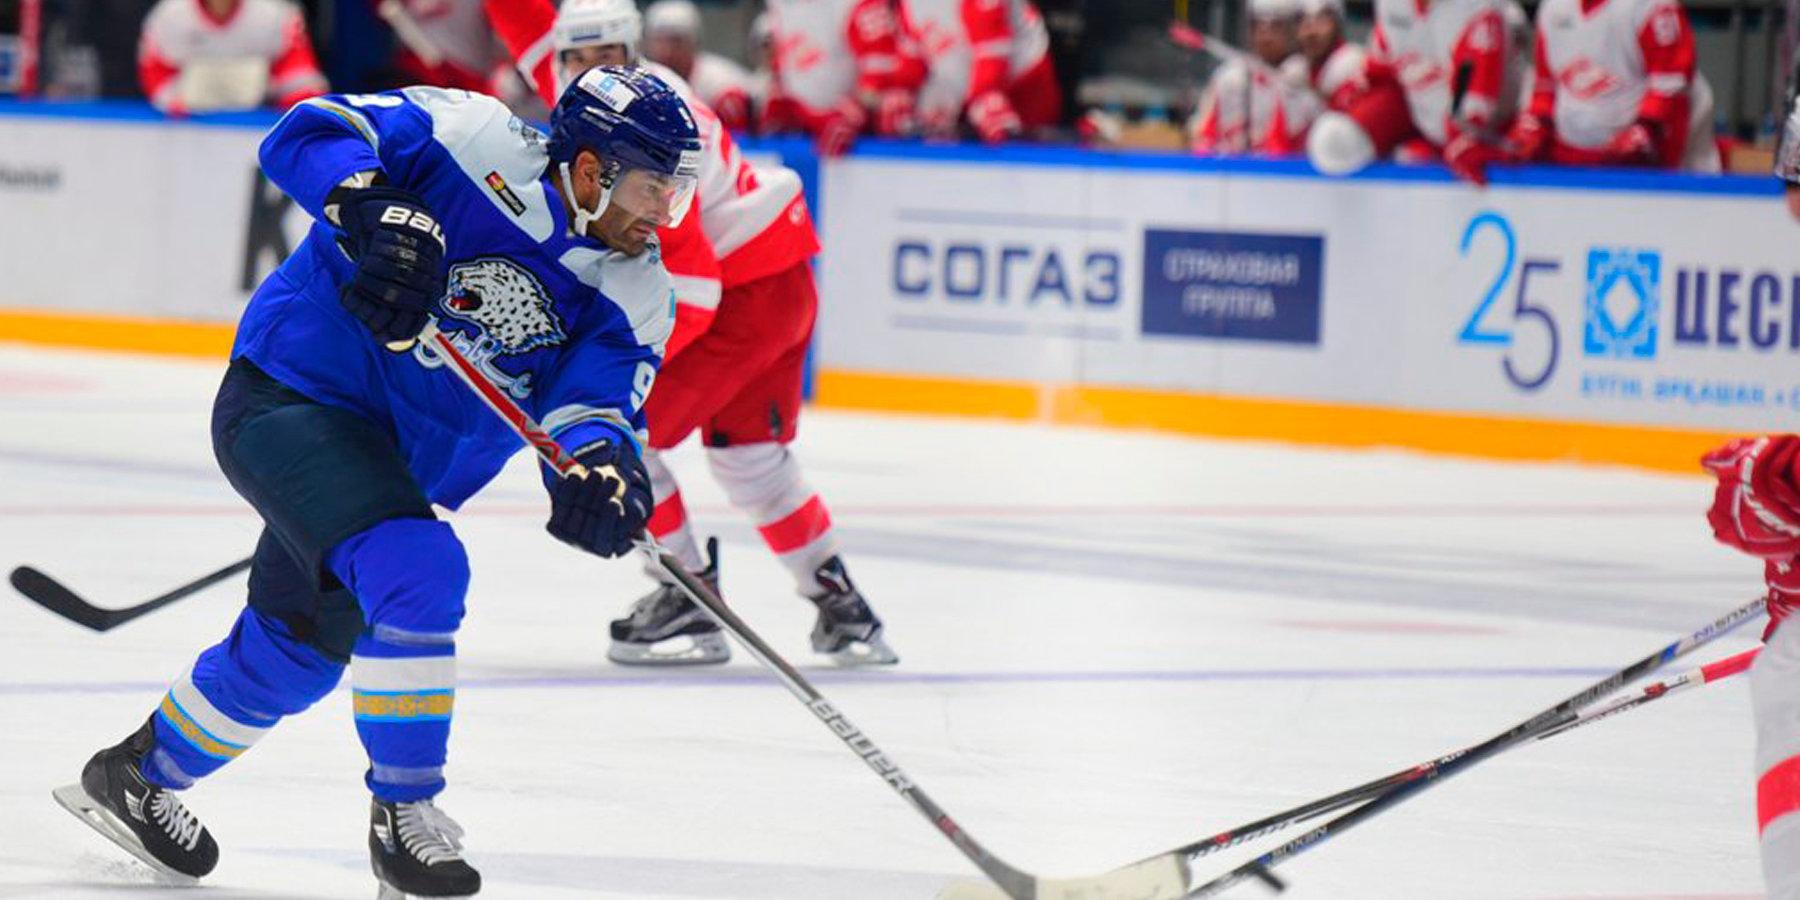 Хоккеист «Барыса» Найджел Доус желает сыграть засборную Казахстана